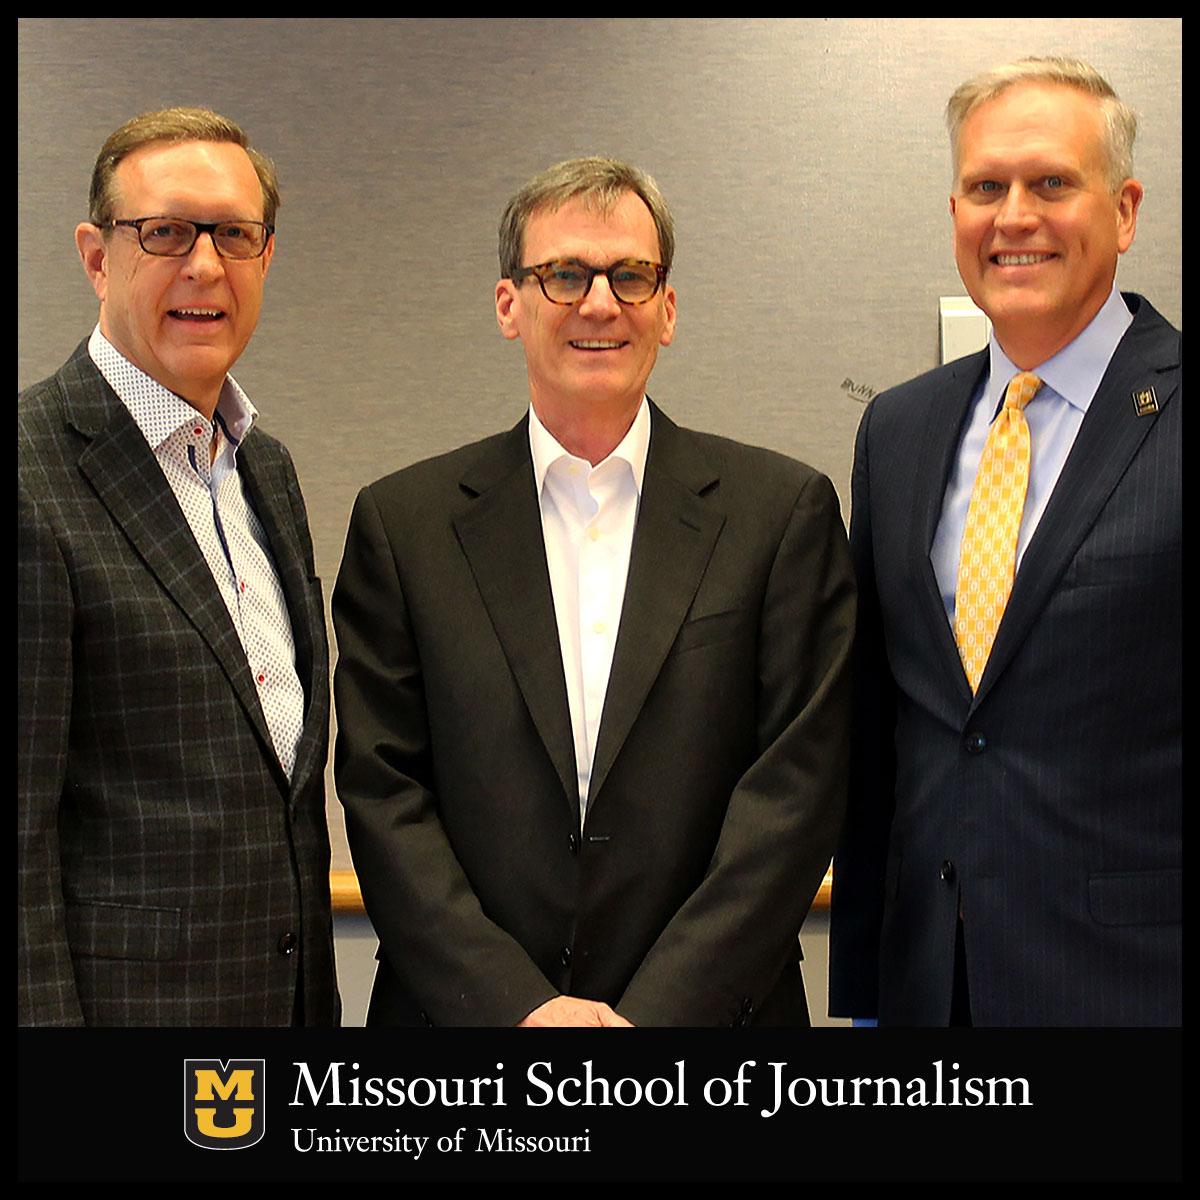 Steve Graham, Berkley Hudson and Dean David Kurpius